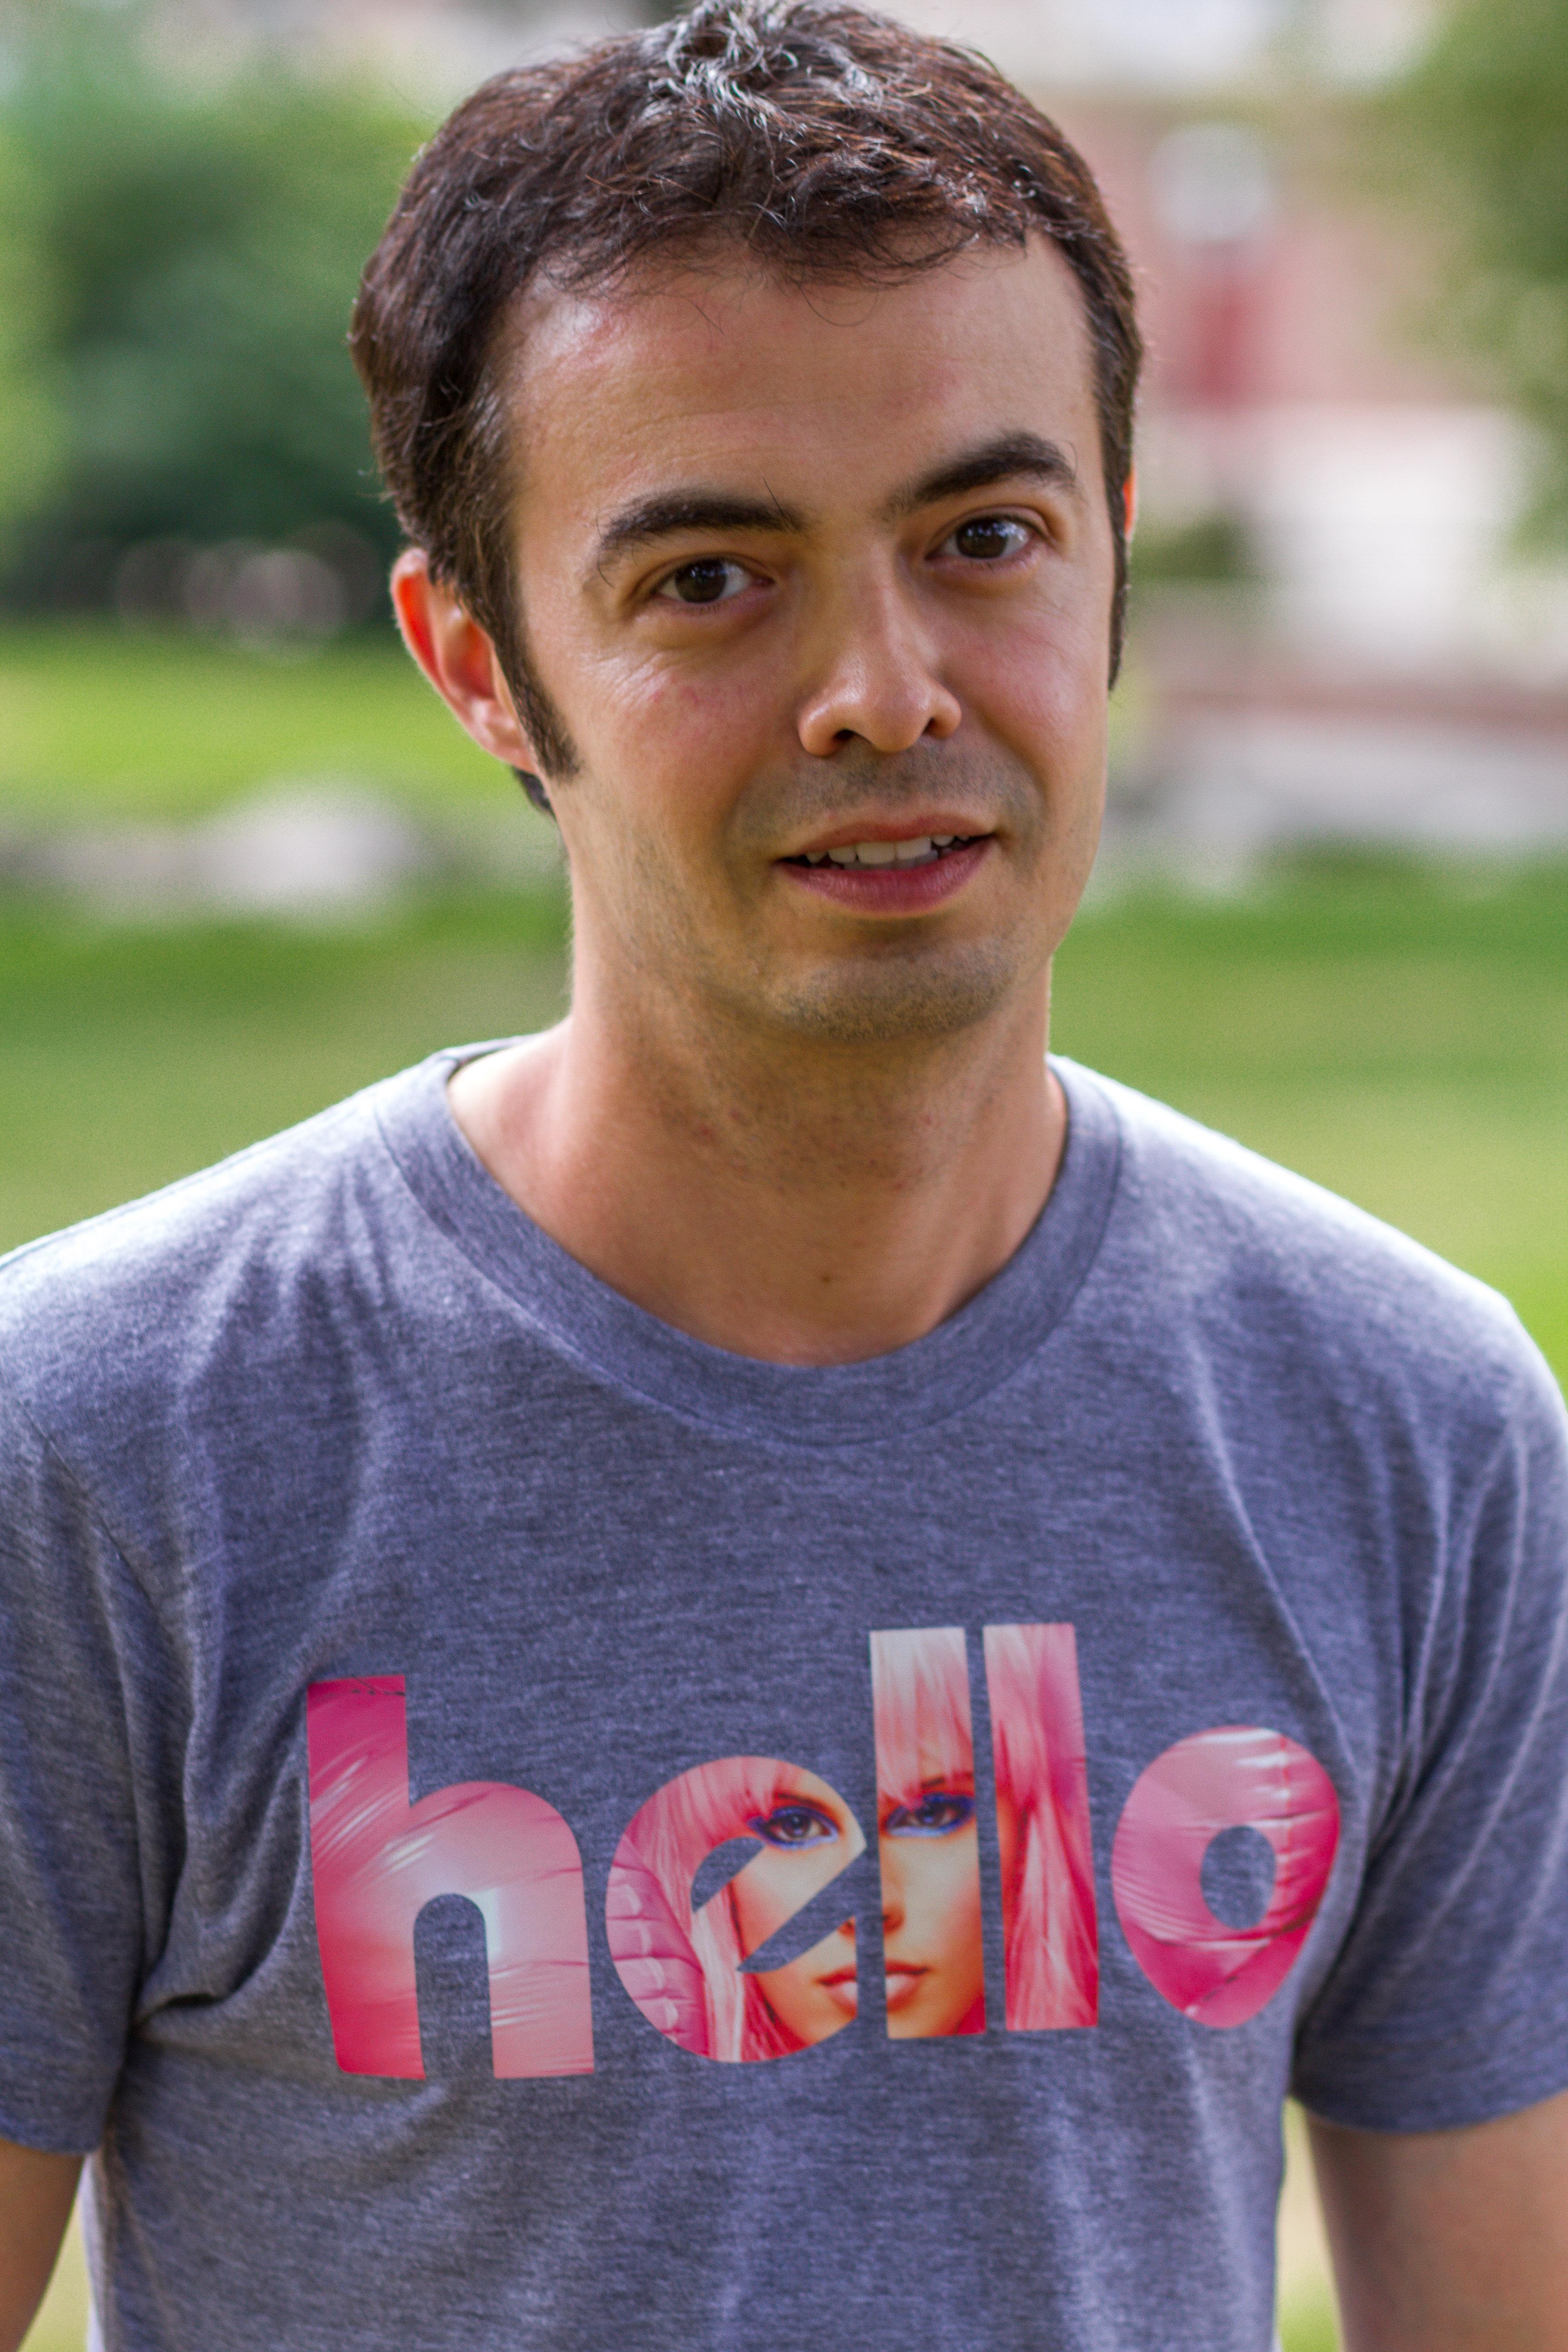 Baixar fotos do orkut 16